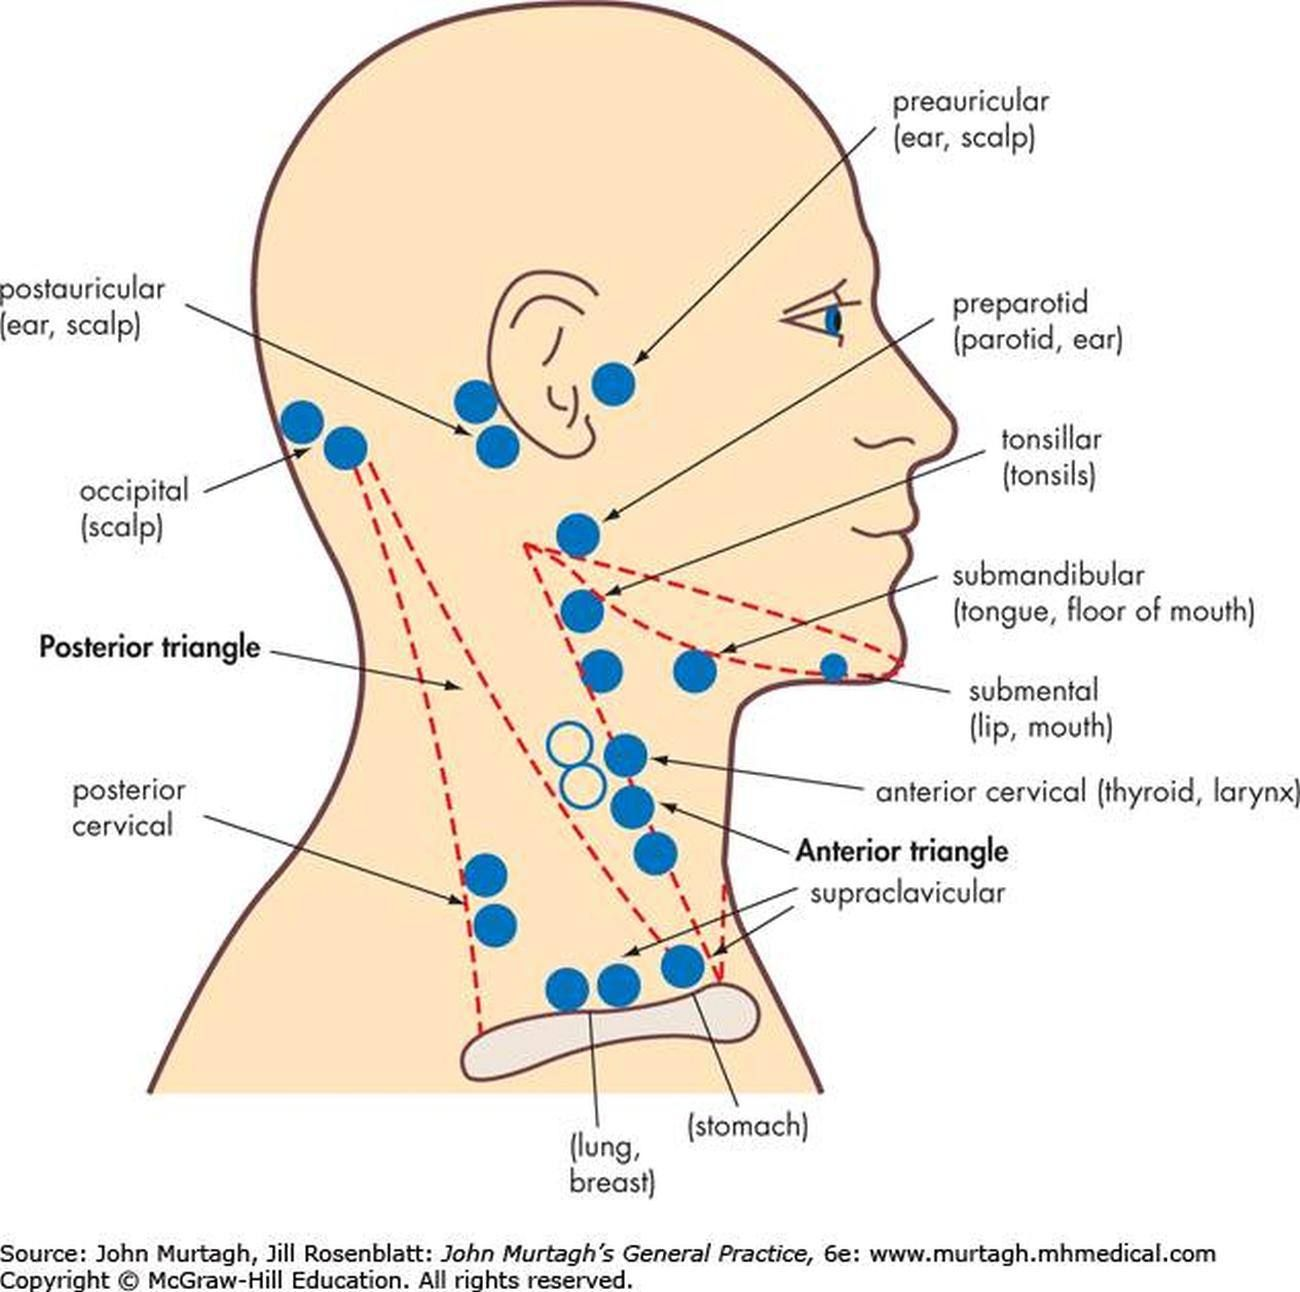 pictures of anterior cervical lymph nodes [ 1300 x 1292 Pixel ]